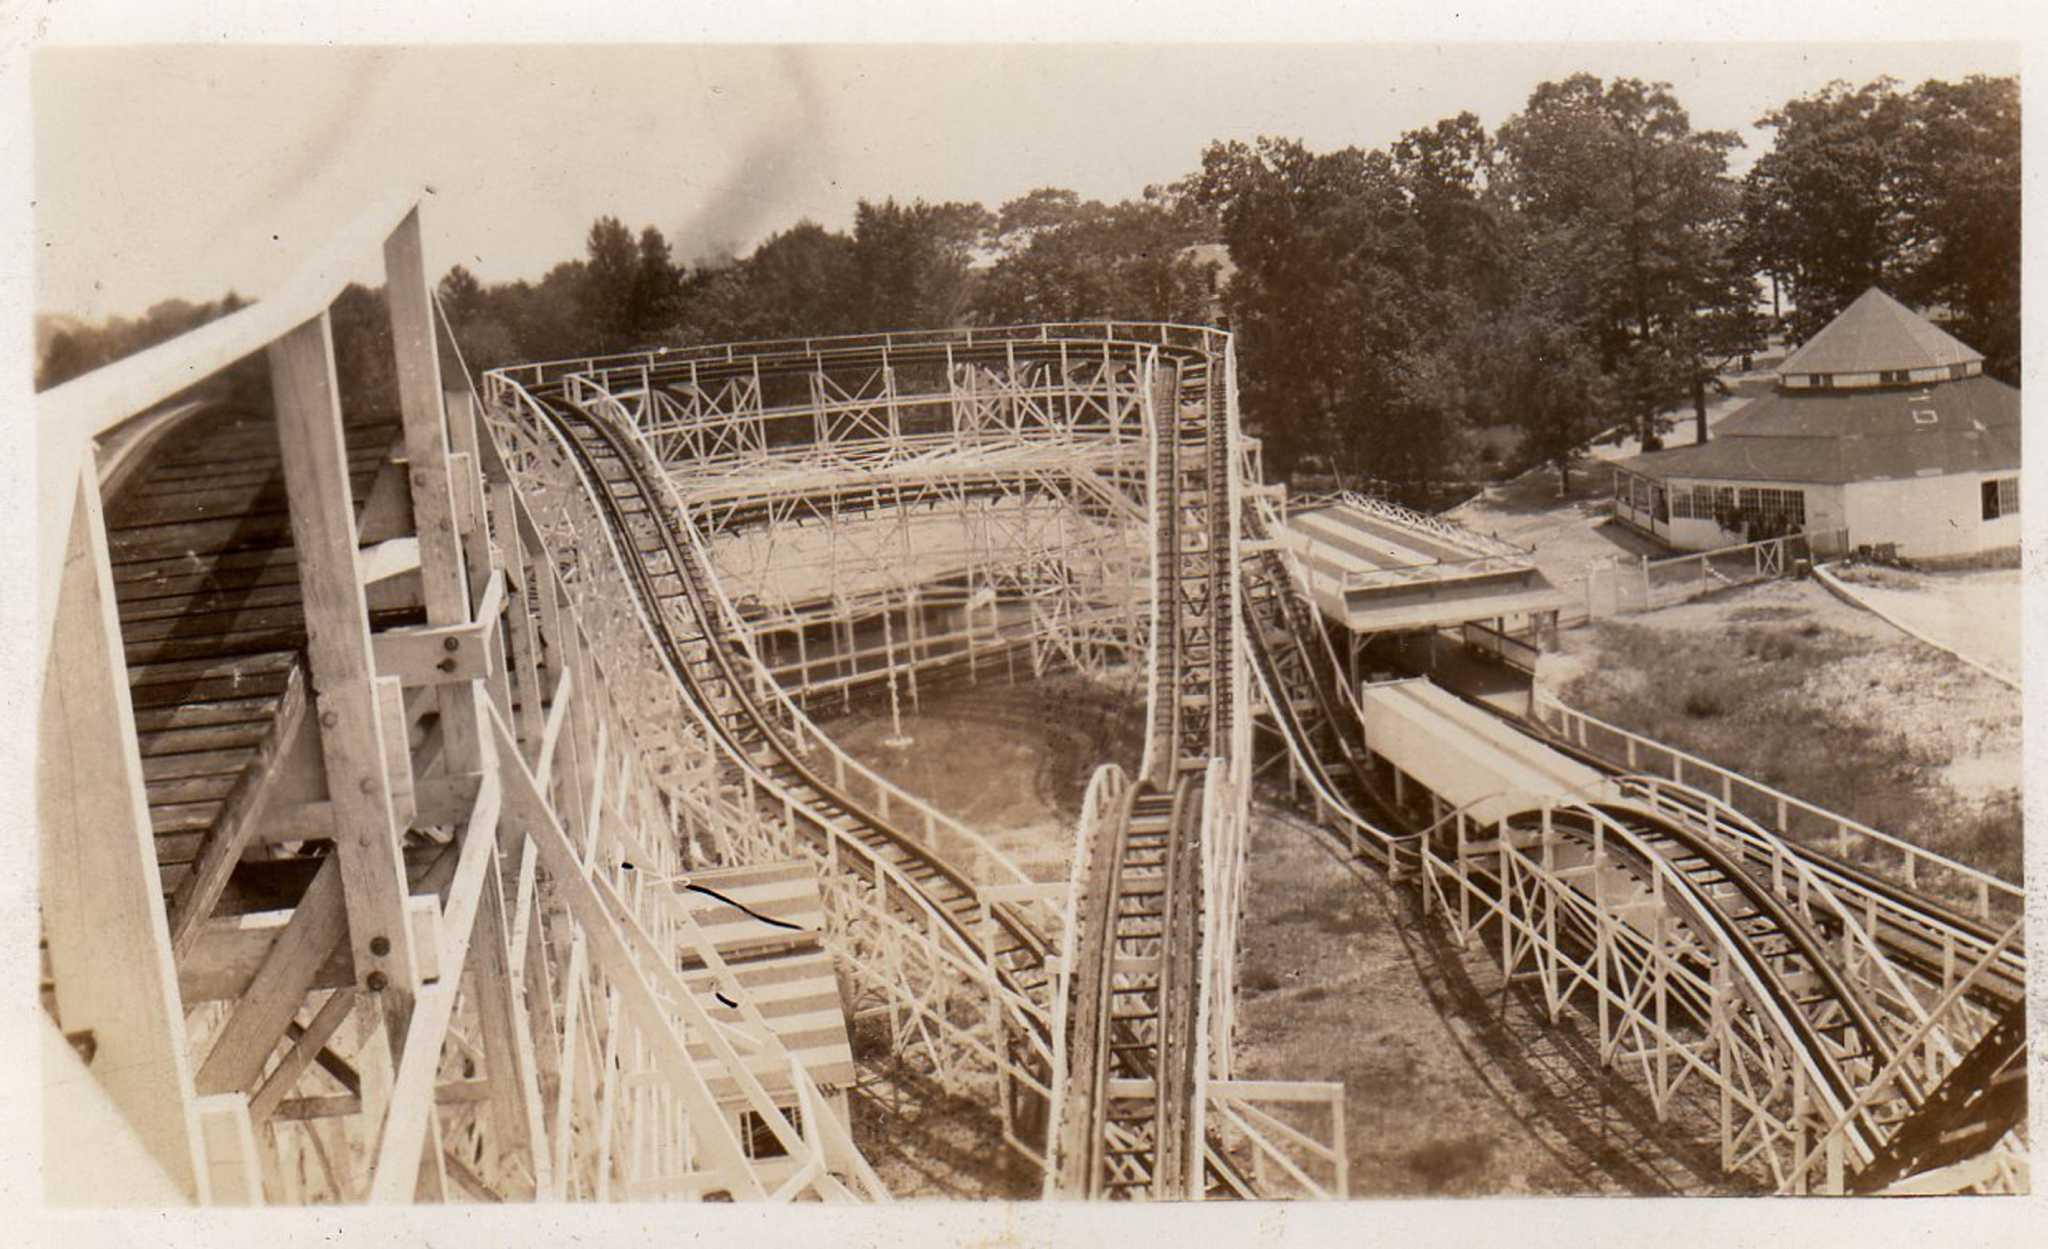 Roton Point Amusement Park Remembered In Rowayton